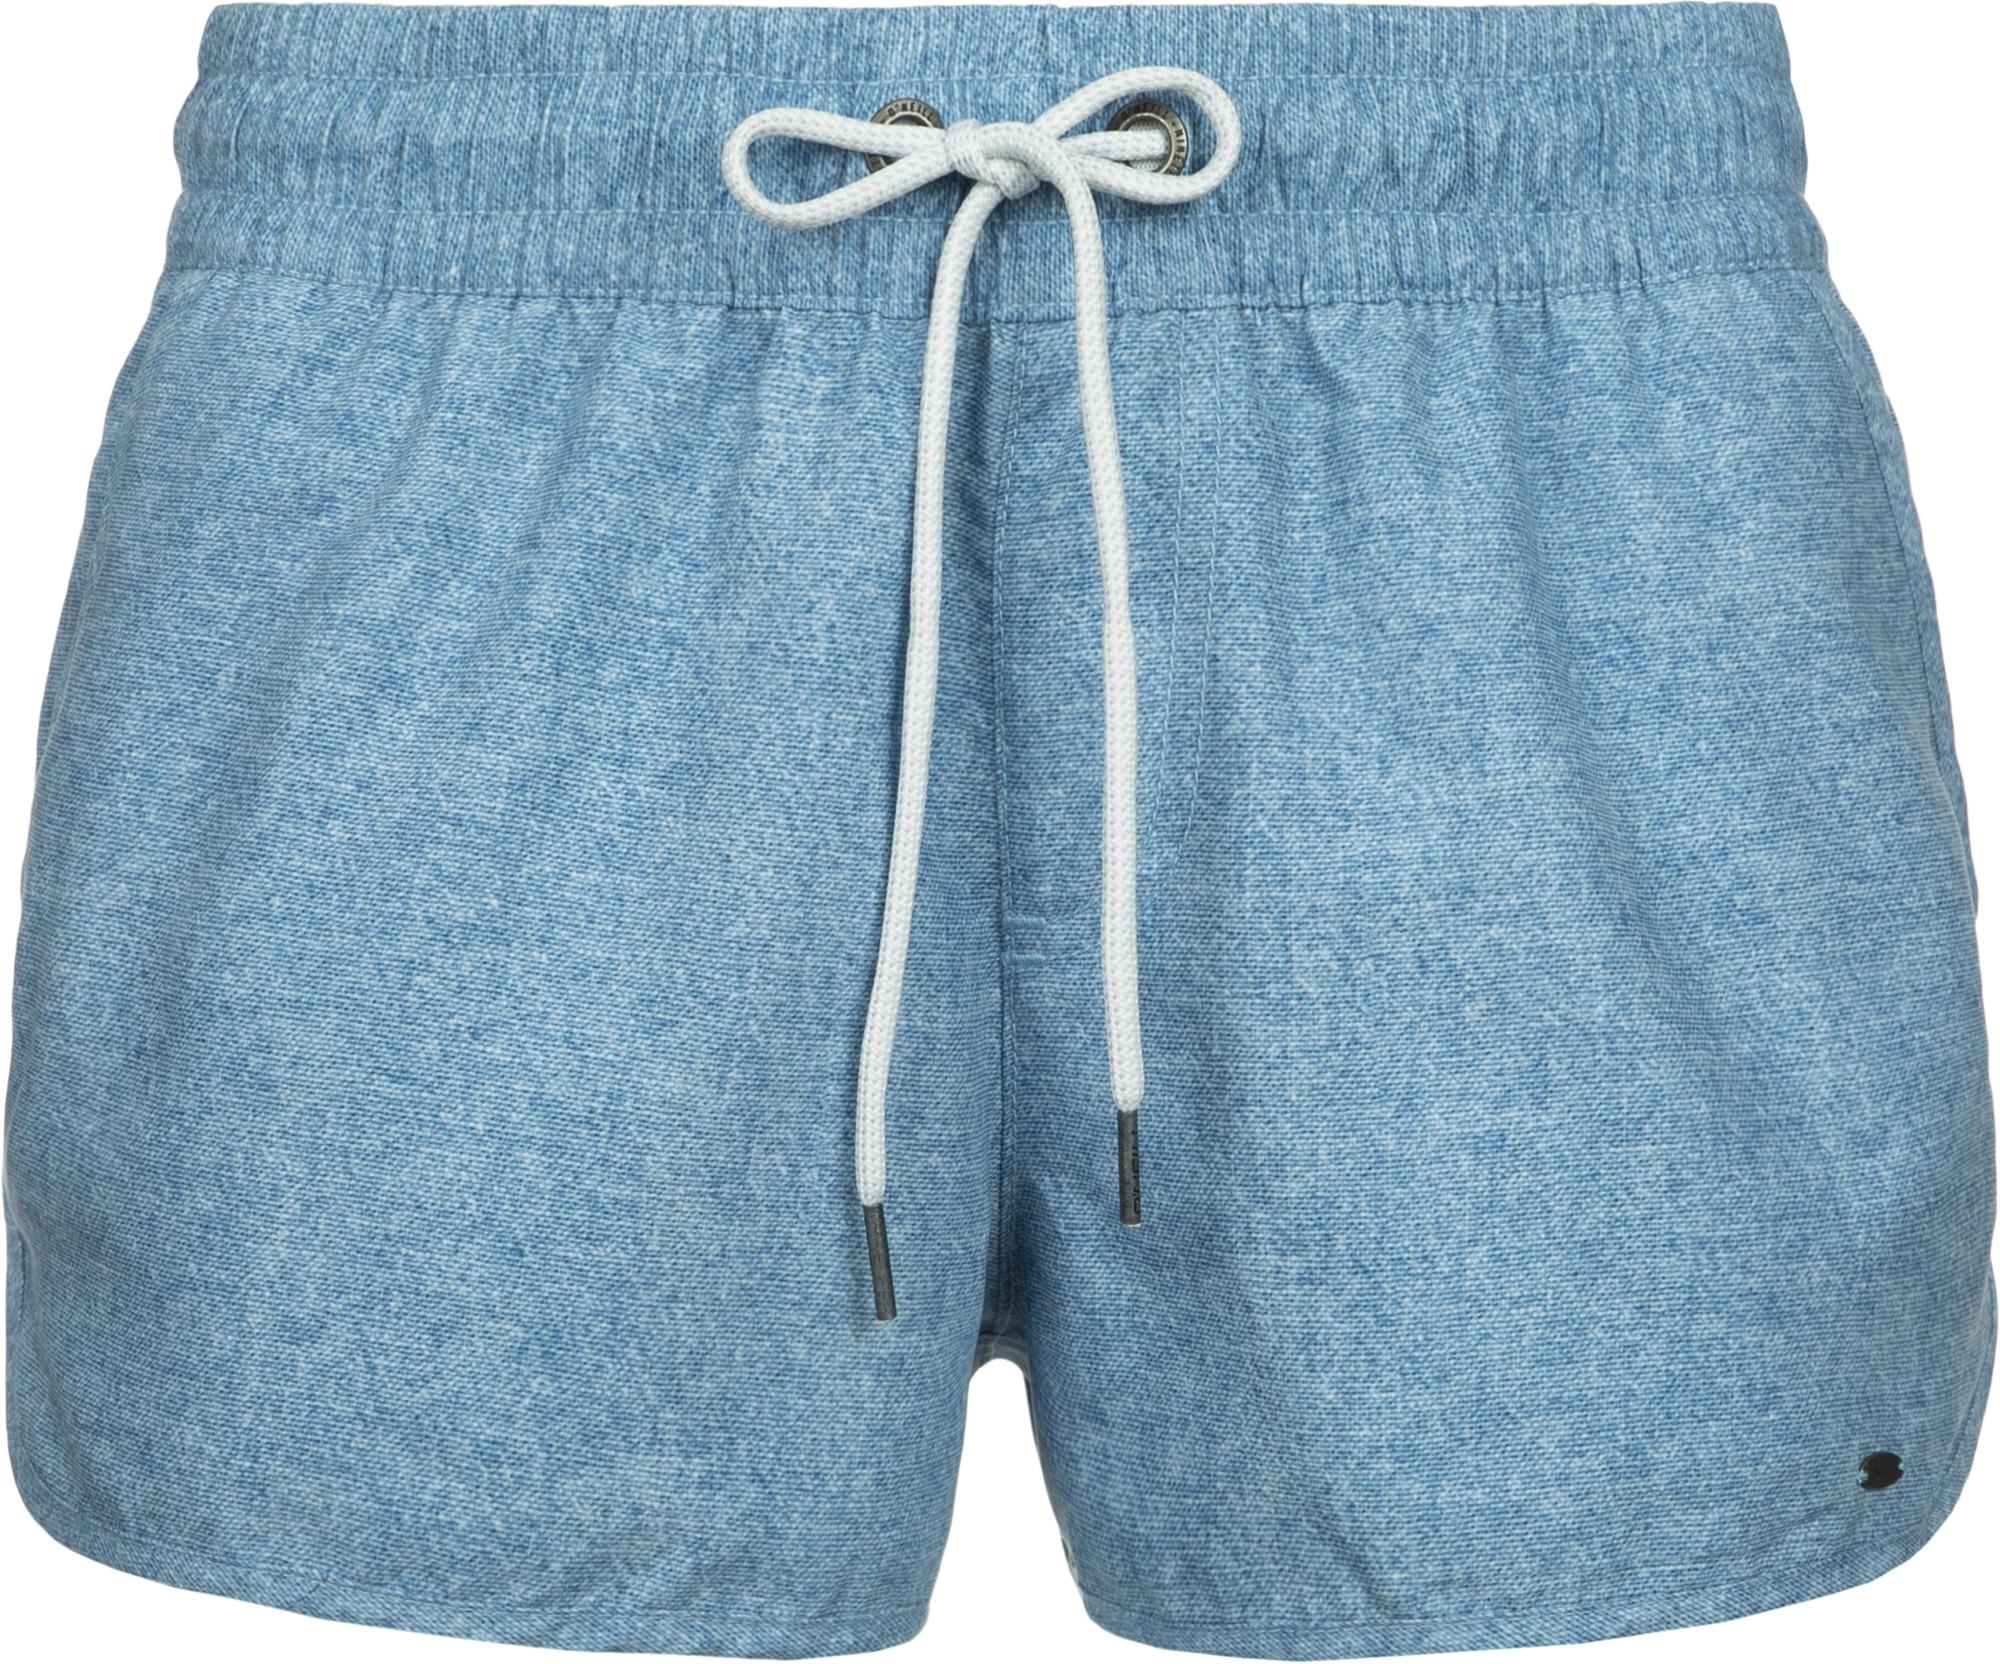 O'Neill Шорты пляжные женские O'Neill Solid, размер 40-42 o neill шорты пляжные мужские o neill cali размер 54 56